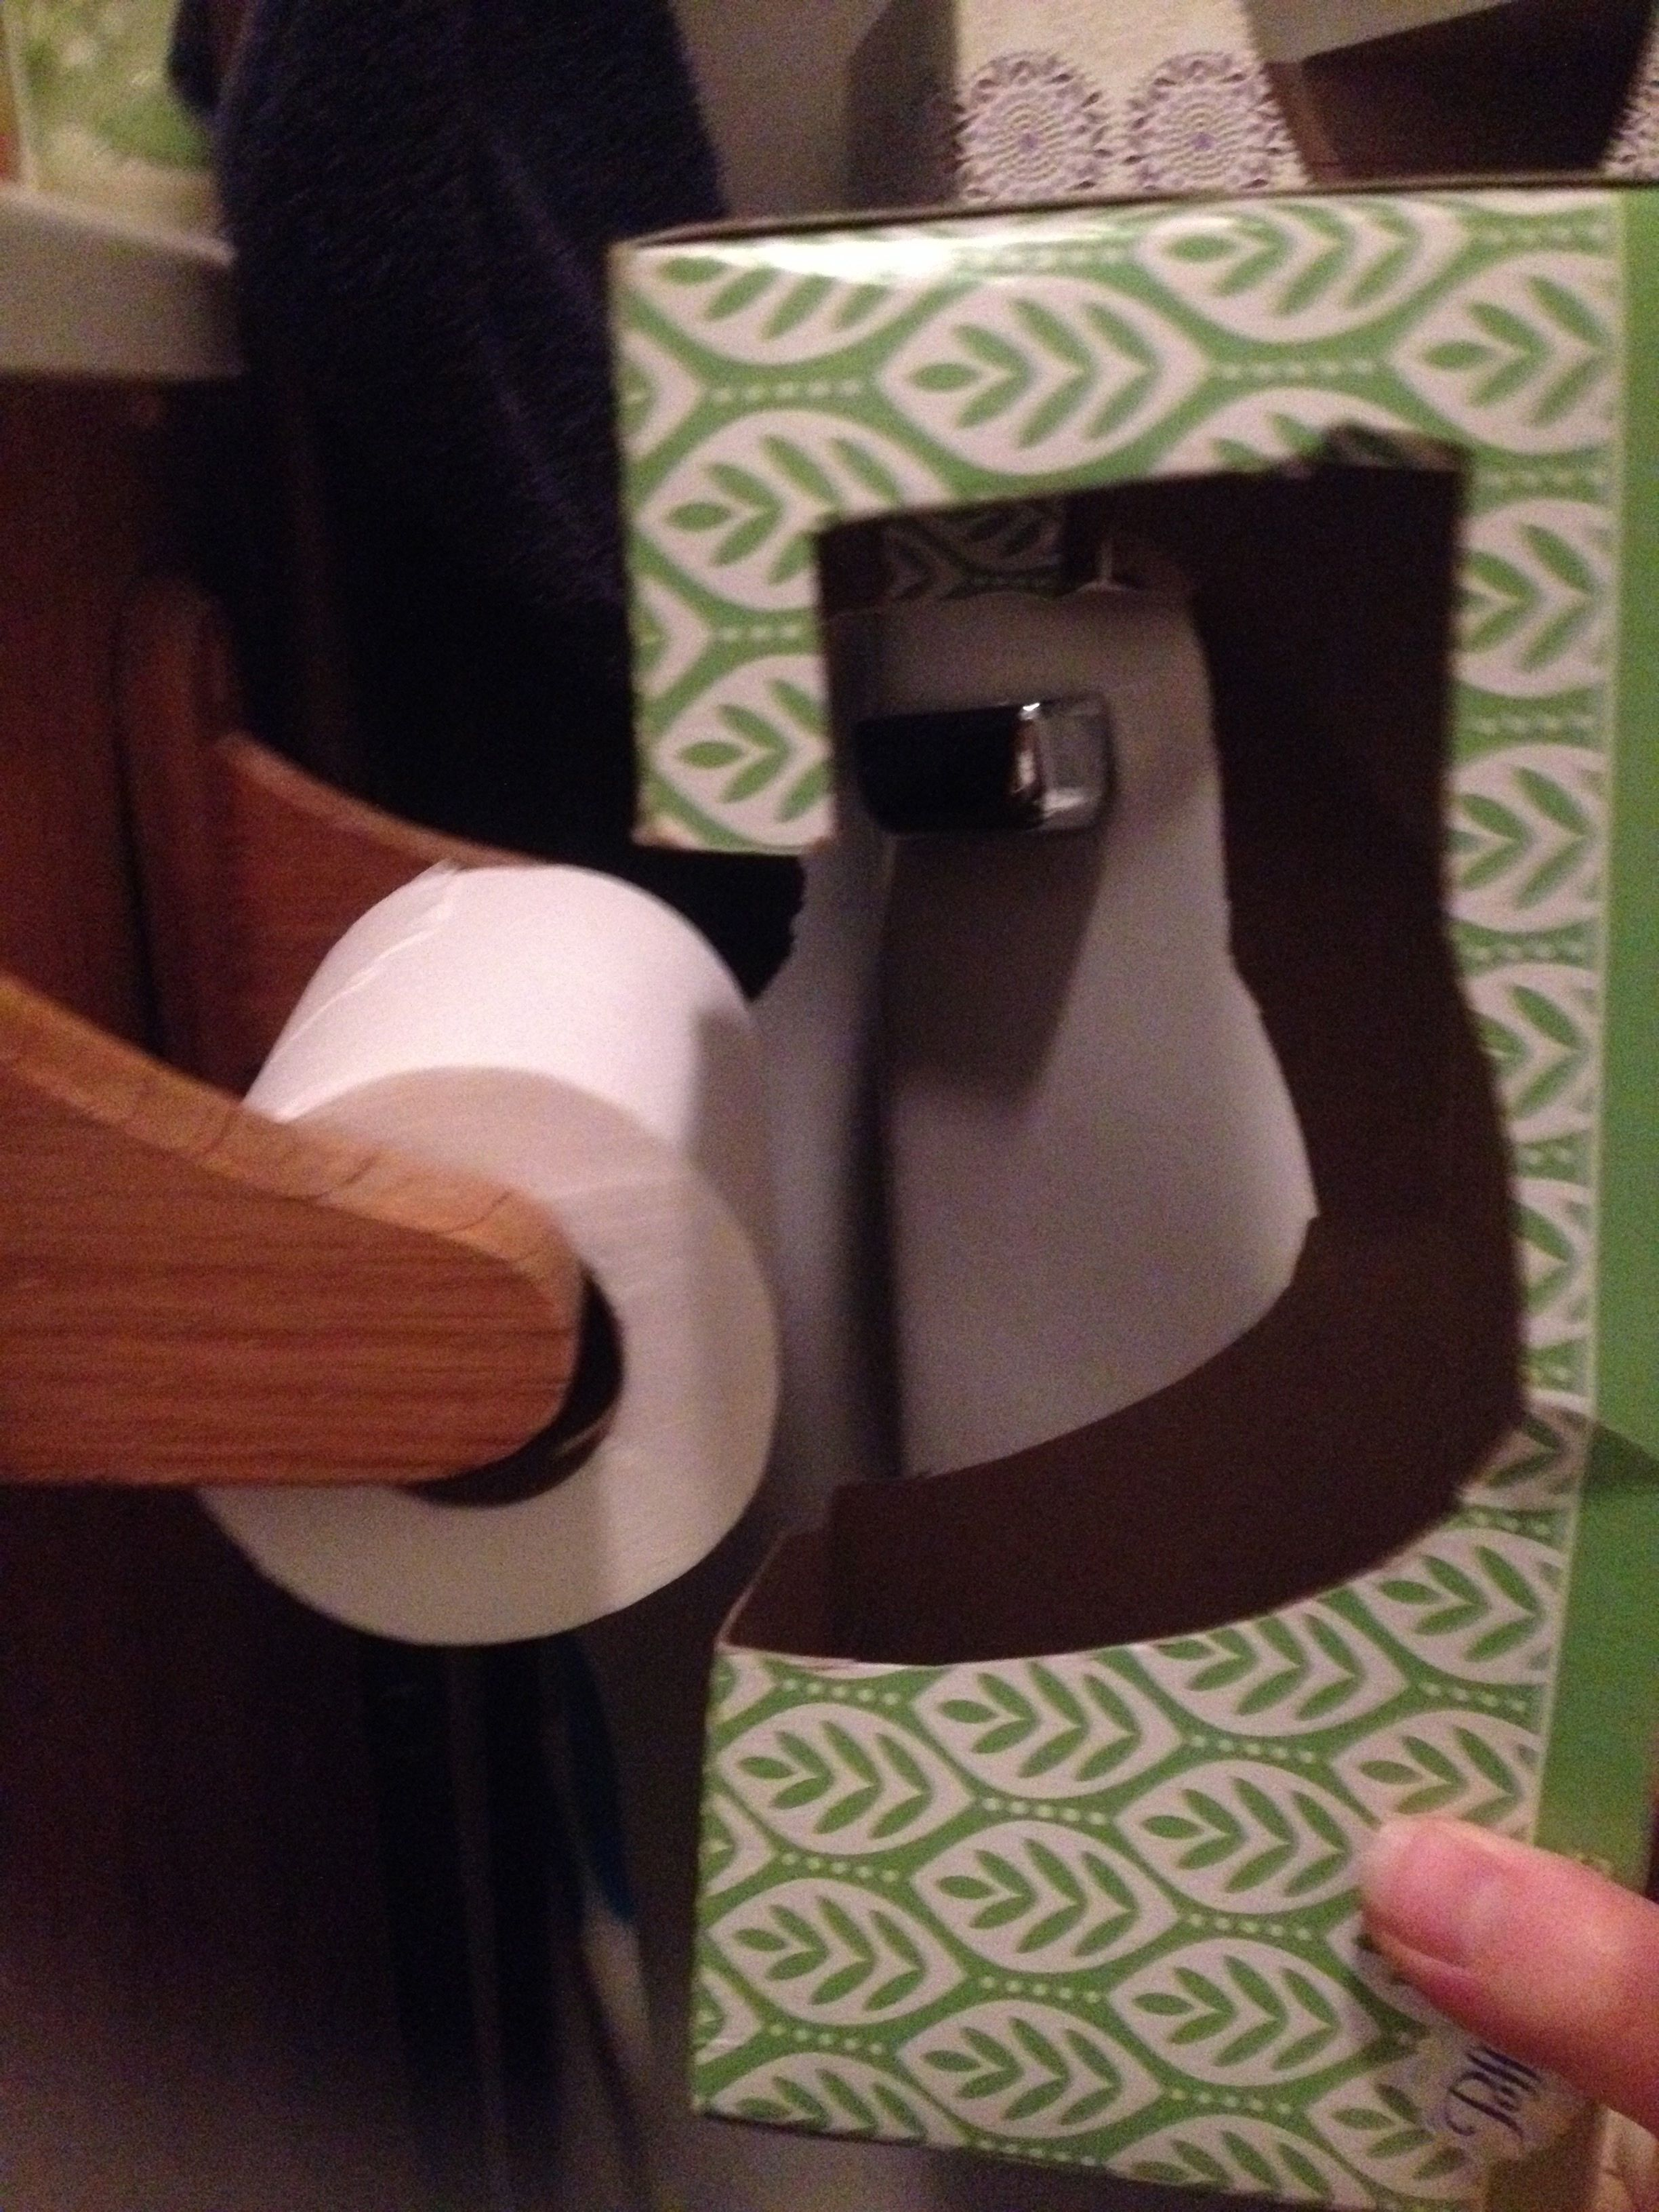 Toilet Paper Guard